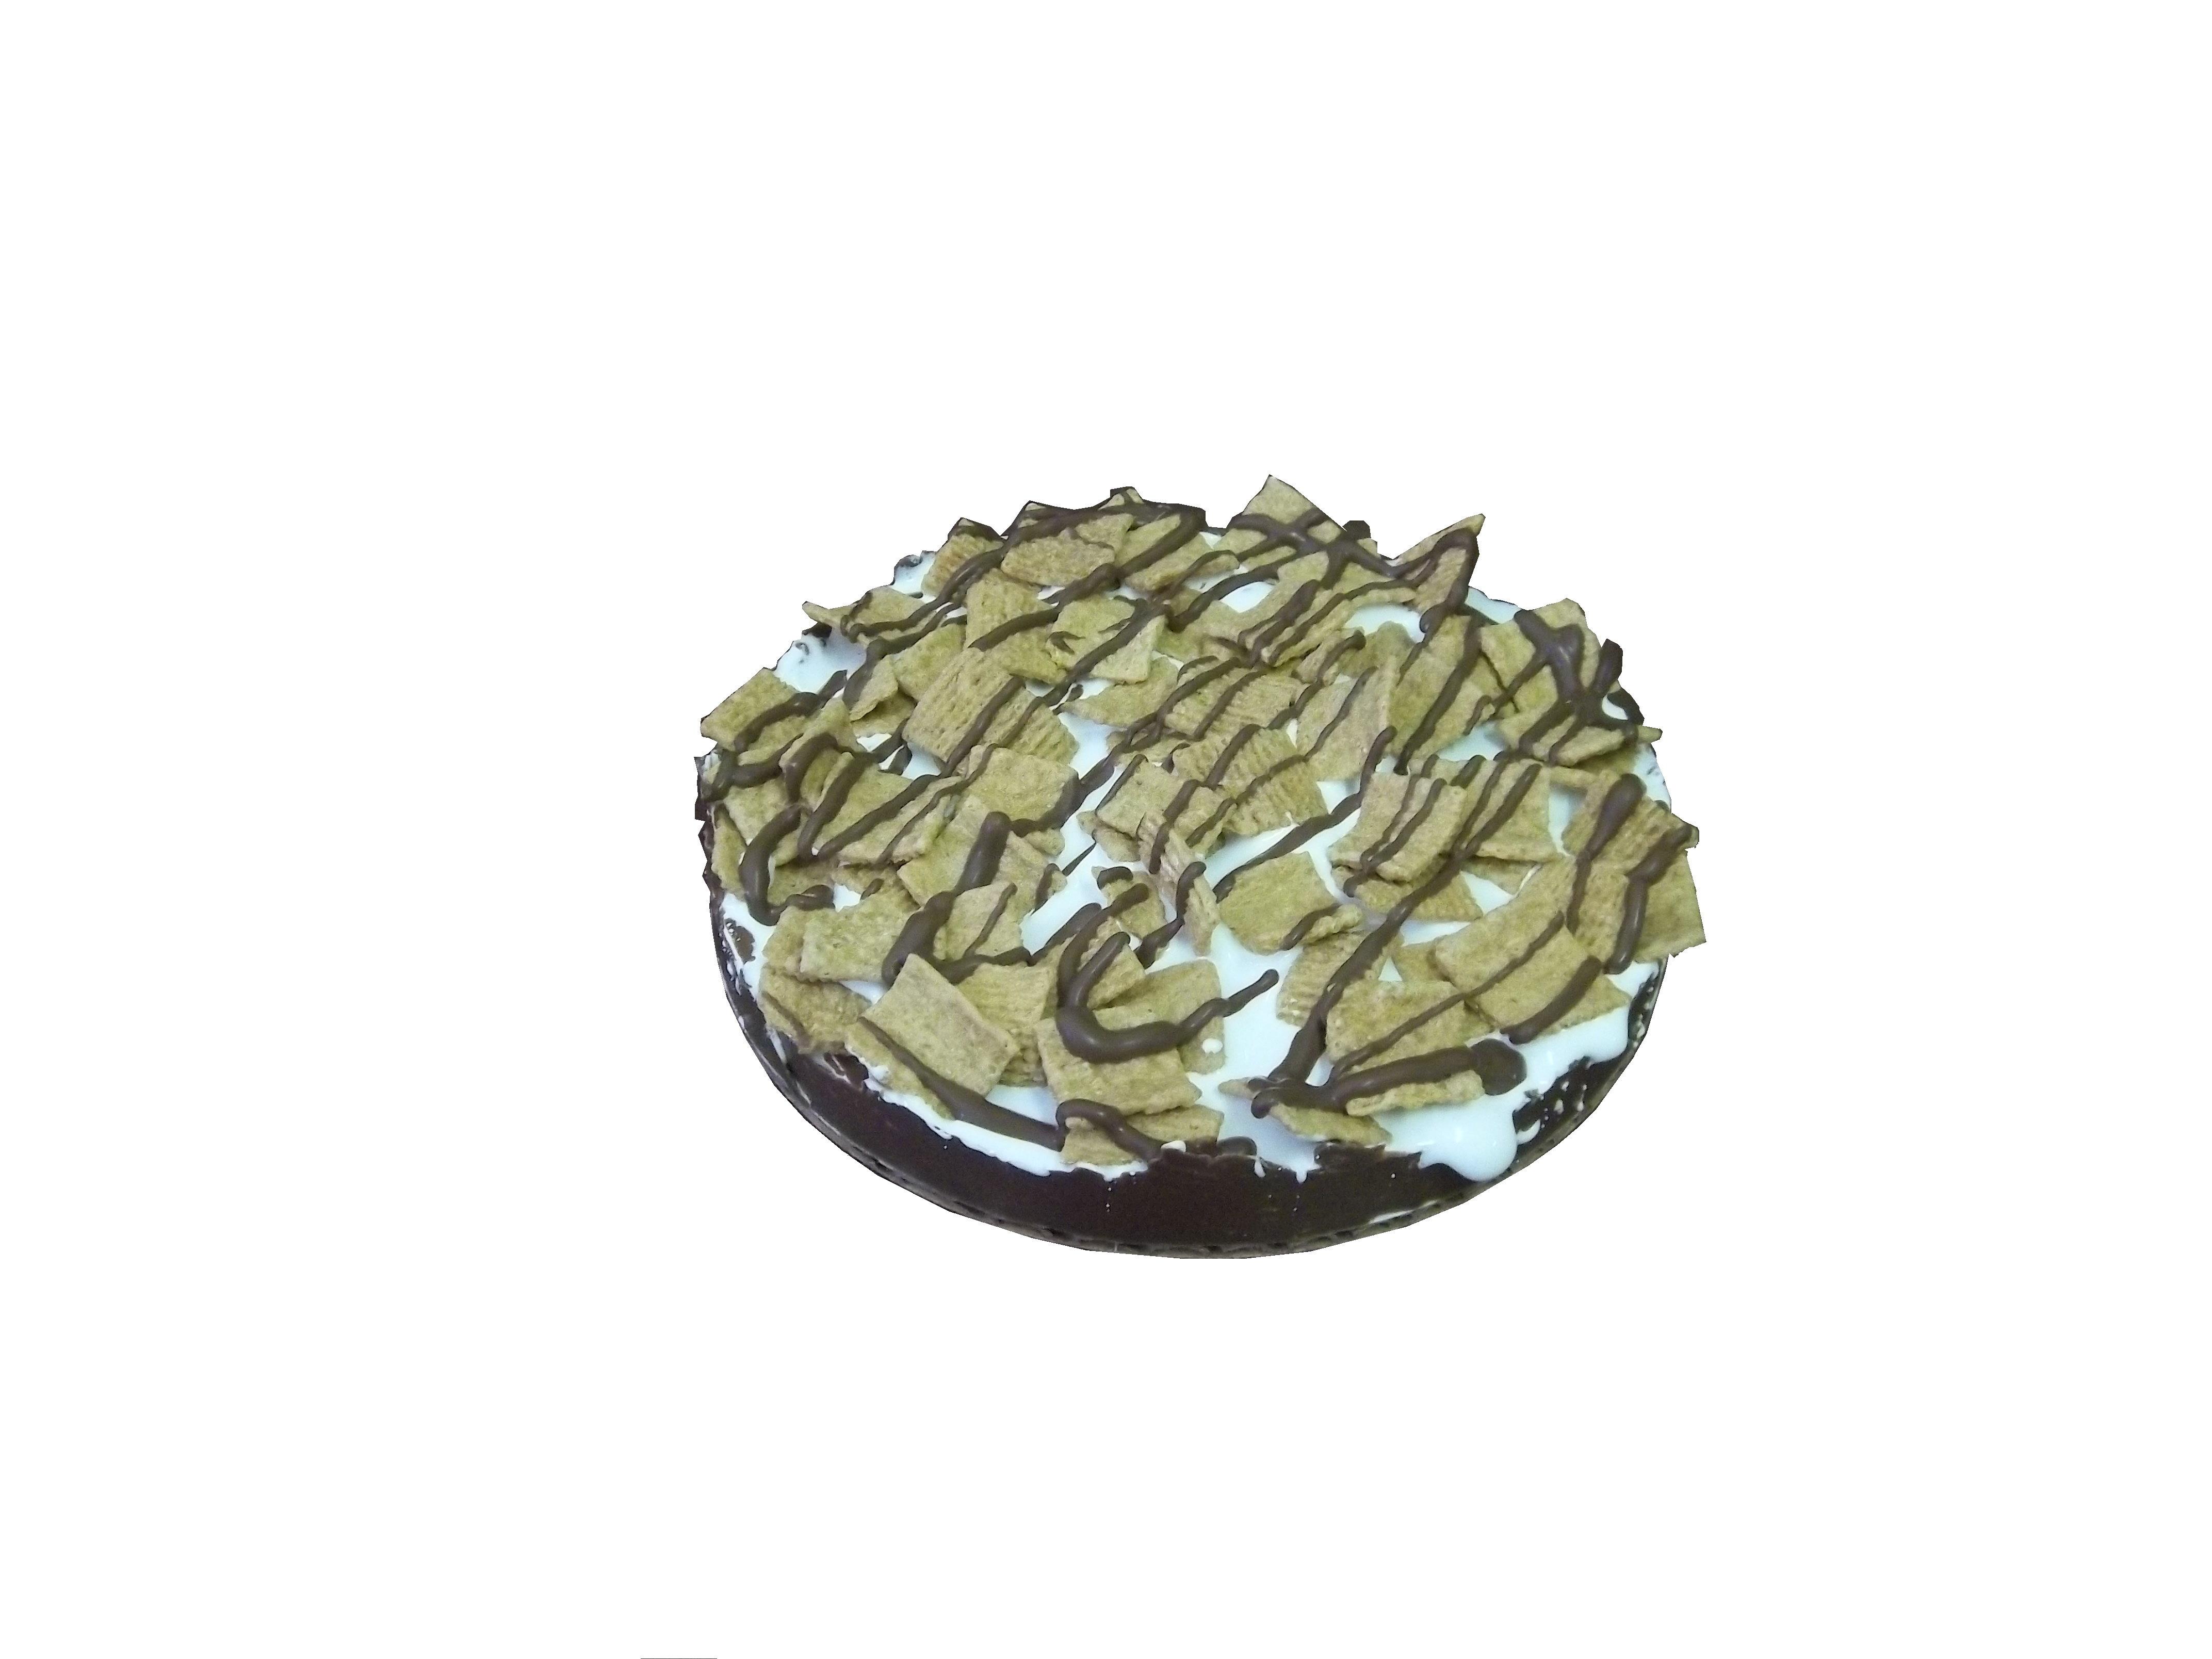 Gourmet Chocolate Pizza - Pizazz™ - Mini - Limited Edition - S'More - Wholesale W-MILSM